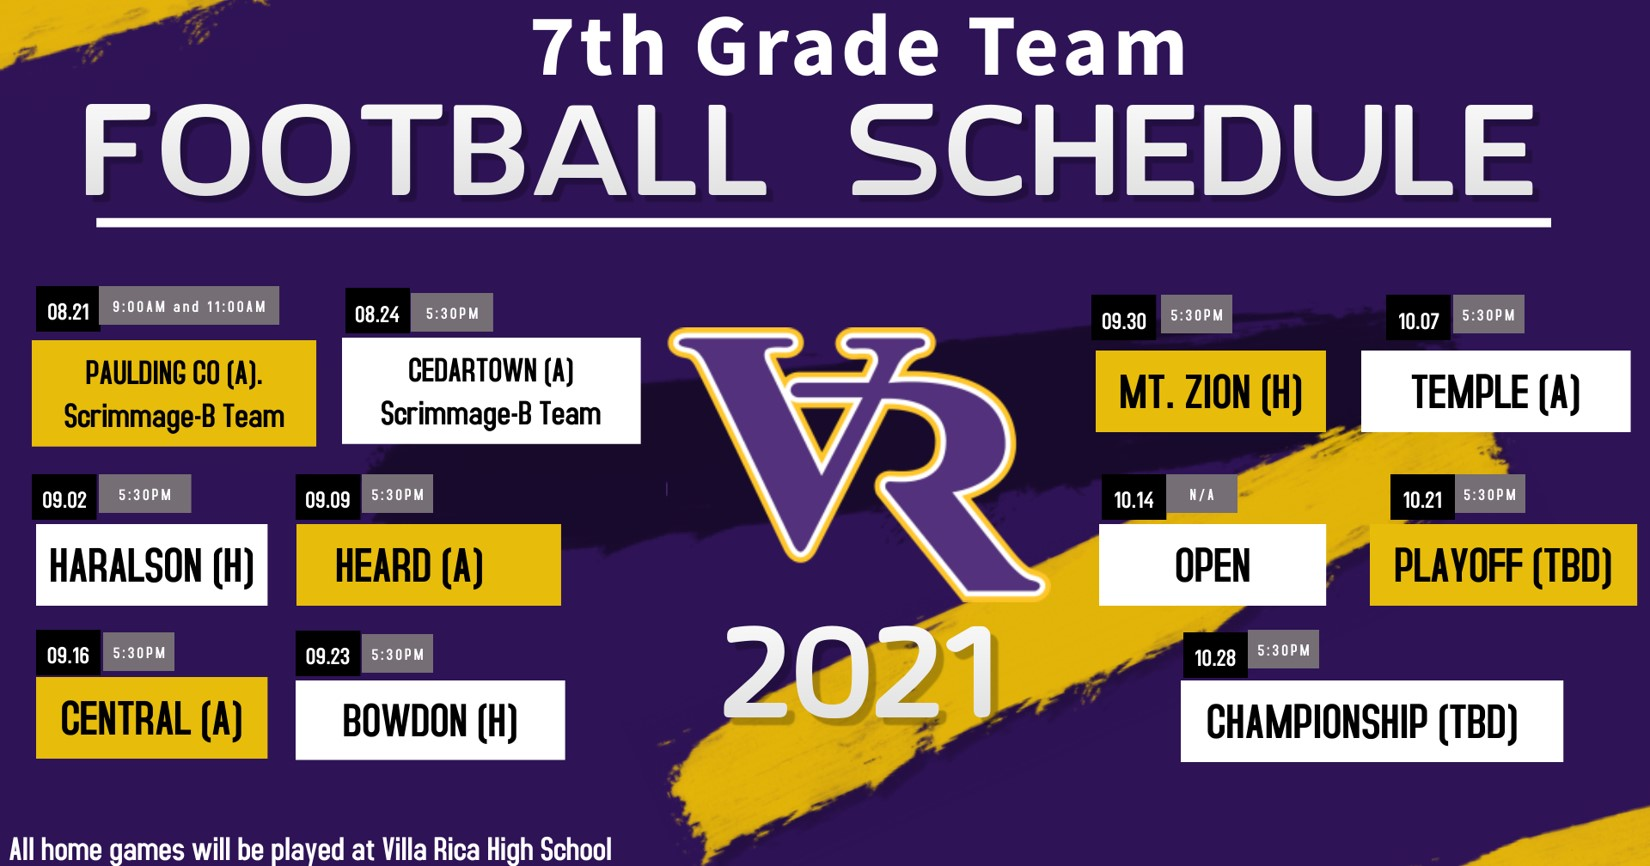 7th grade football schedule photo